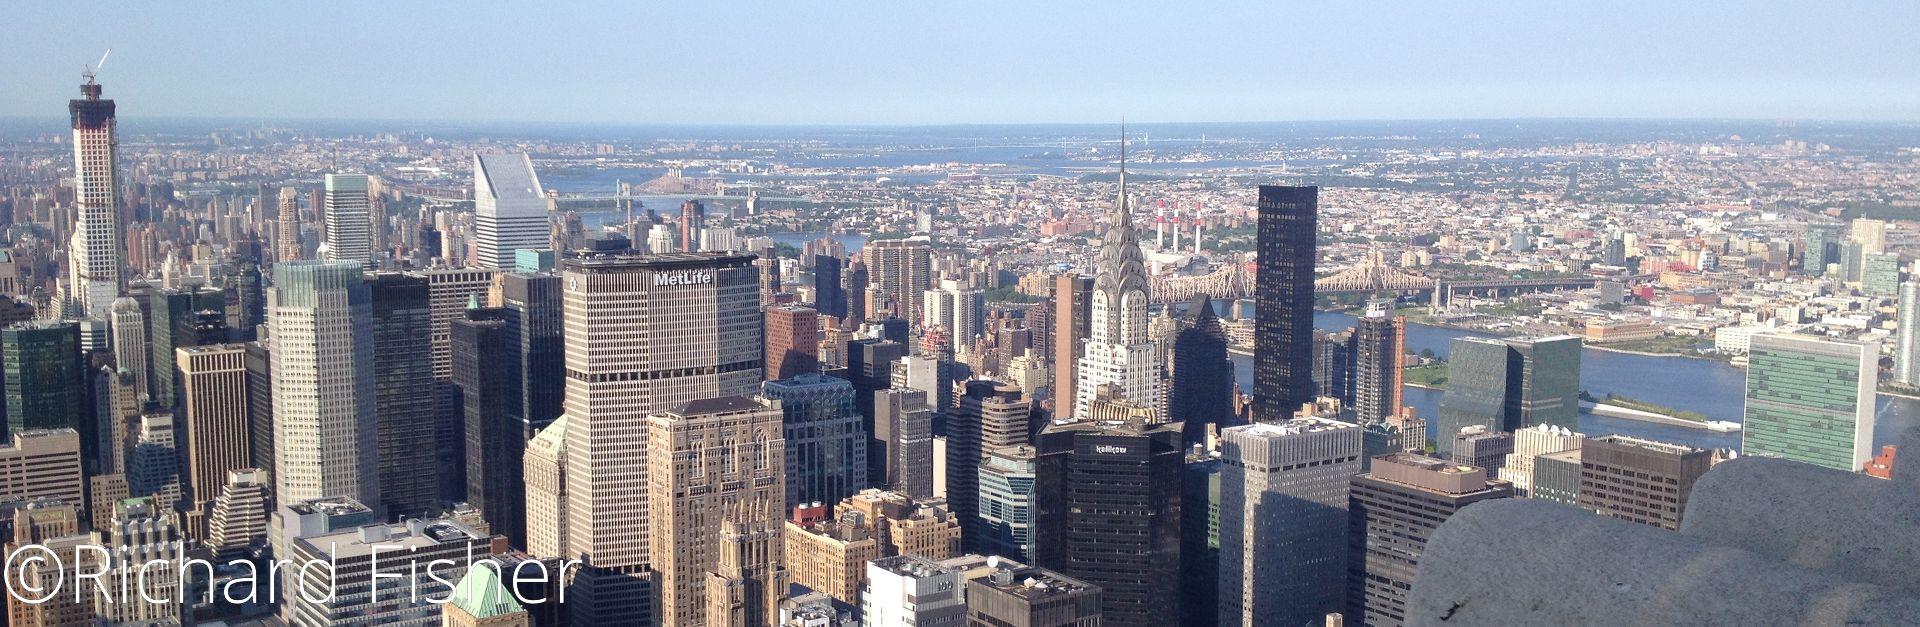 New York, travelling light.